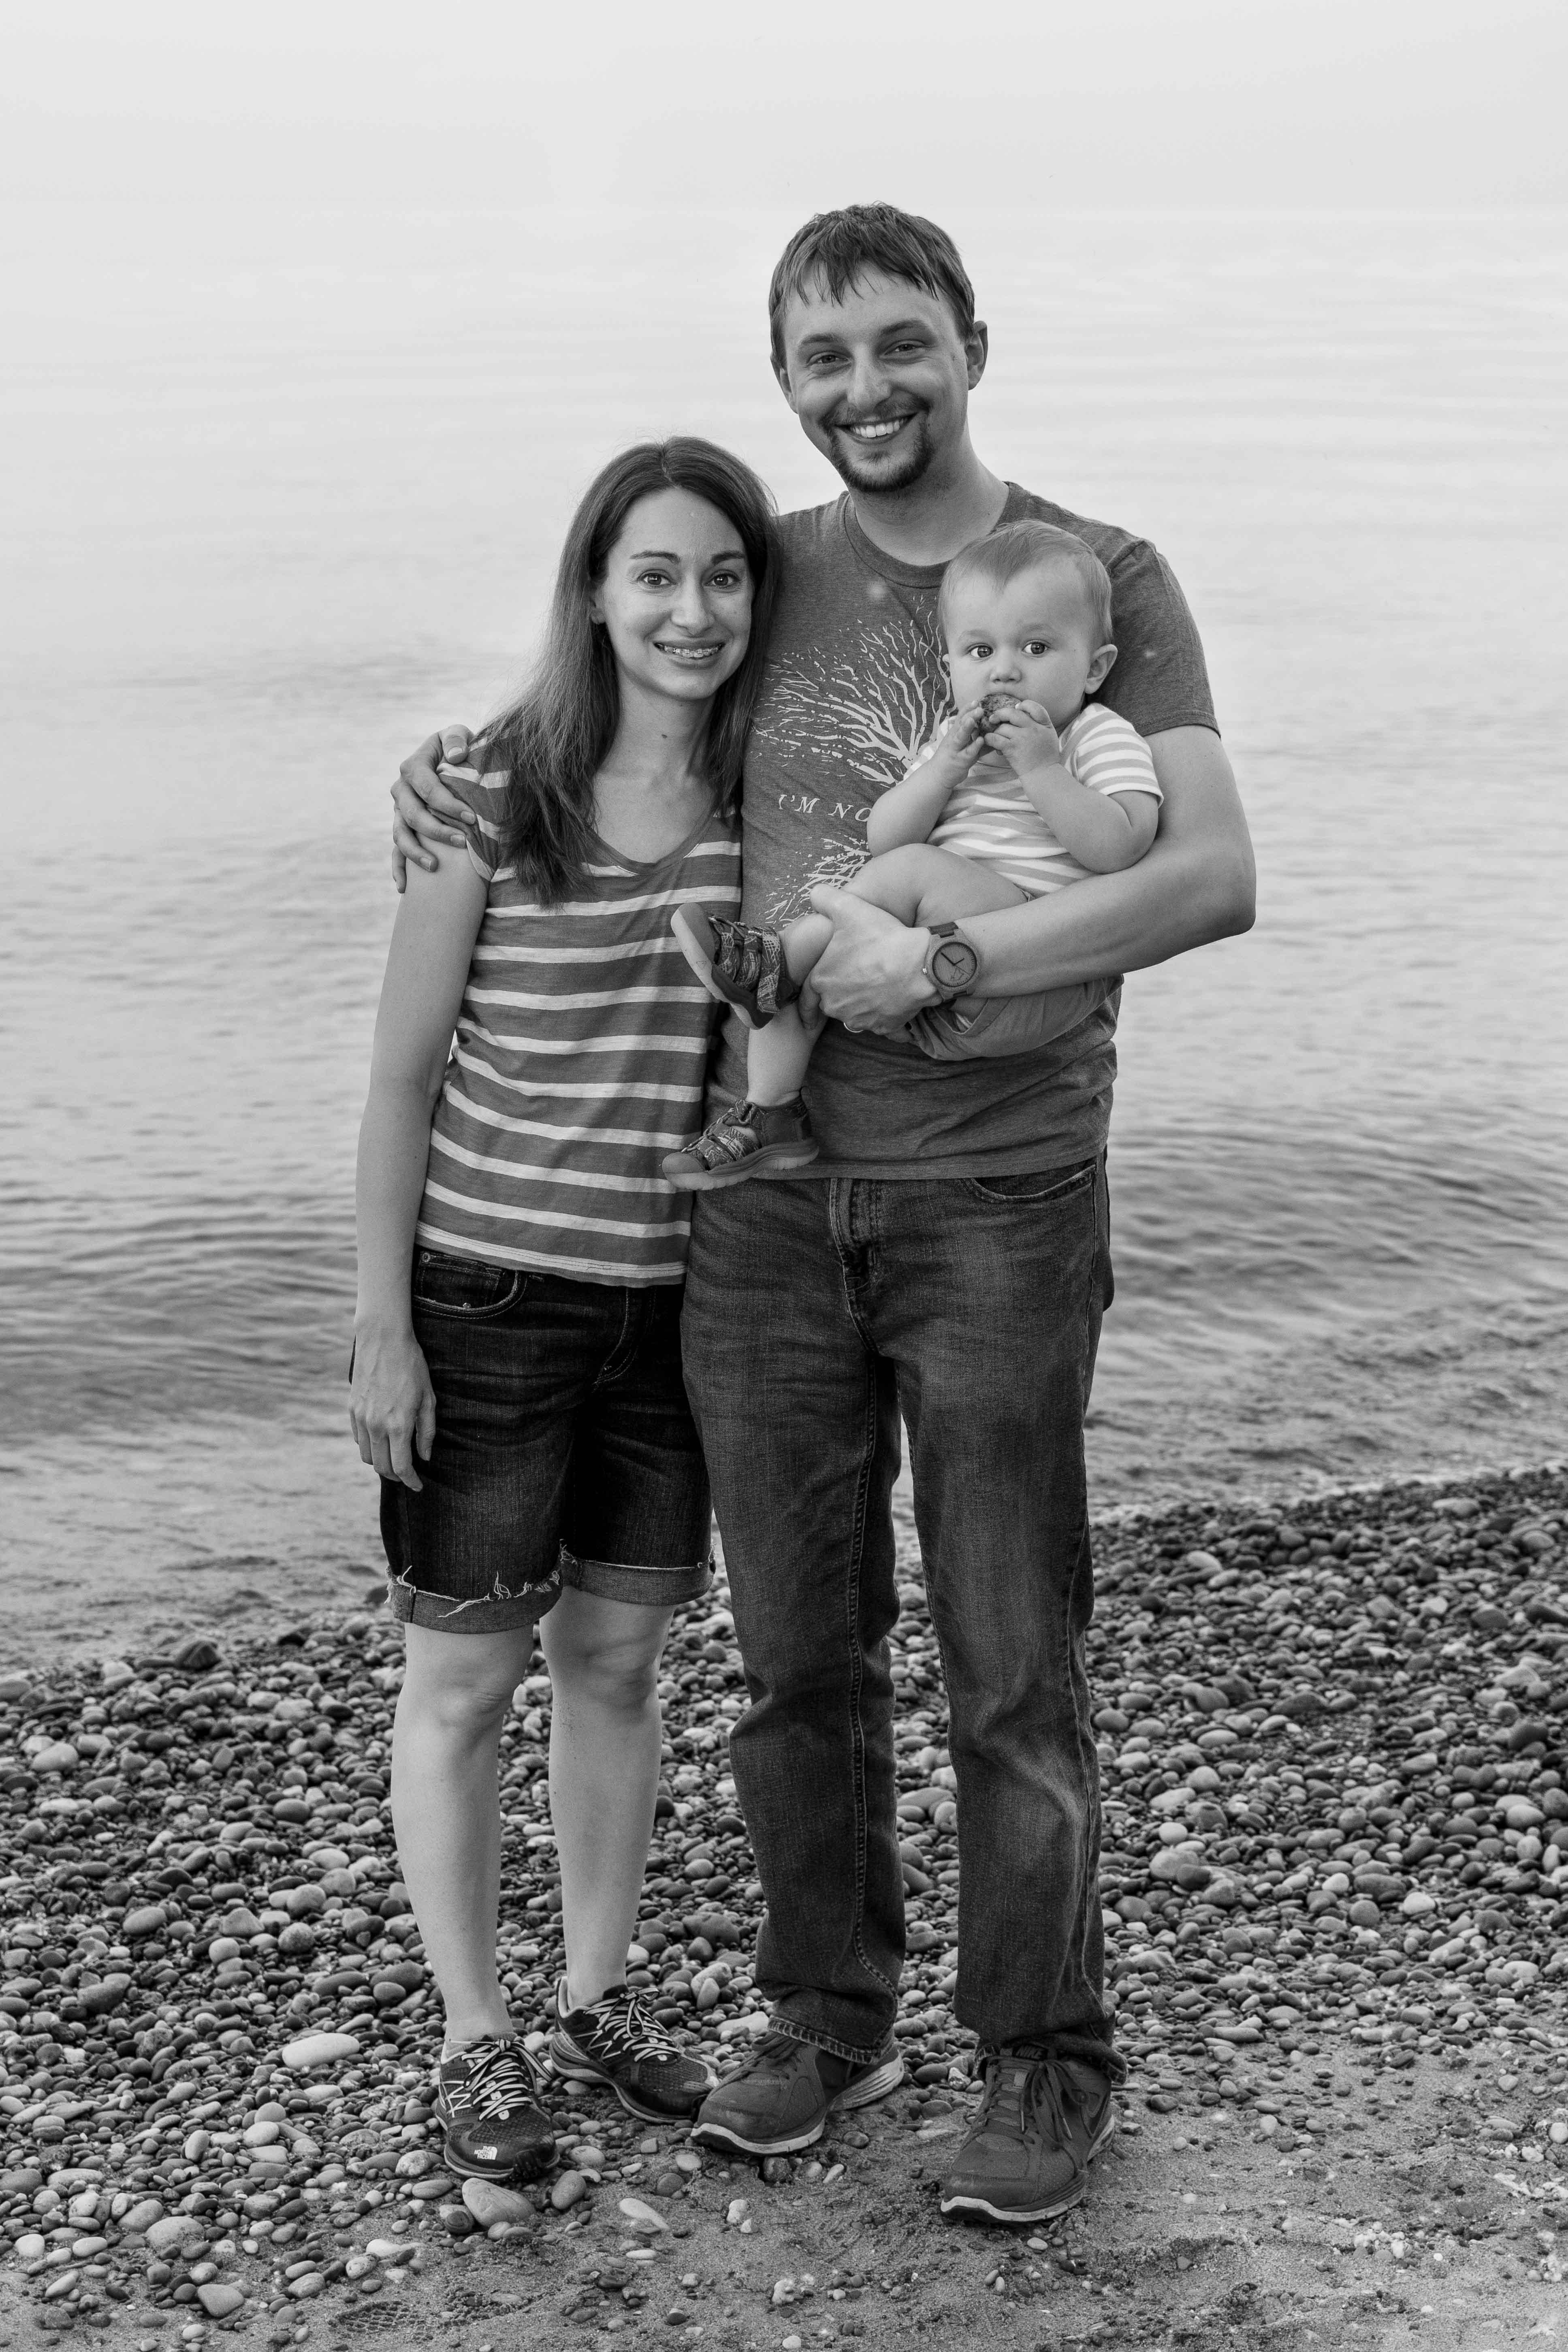 Family July 2018   https://www.roseclearfield.com